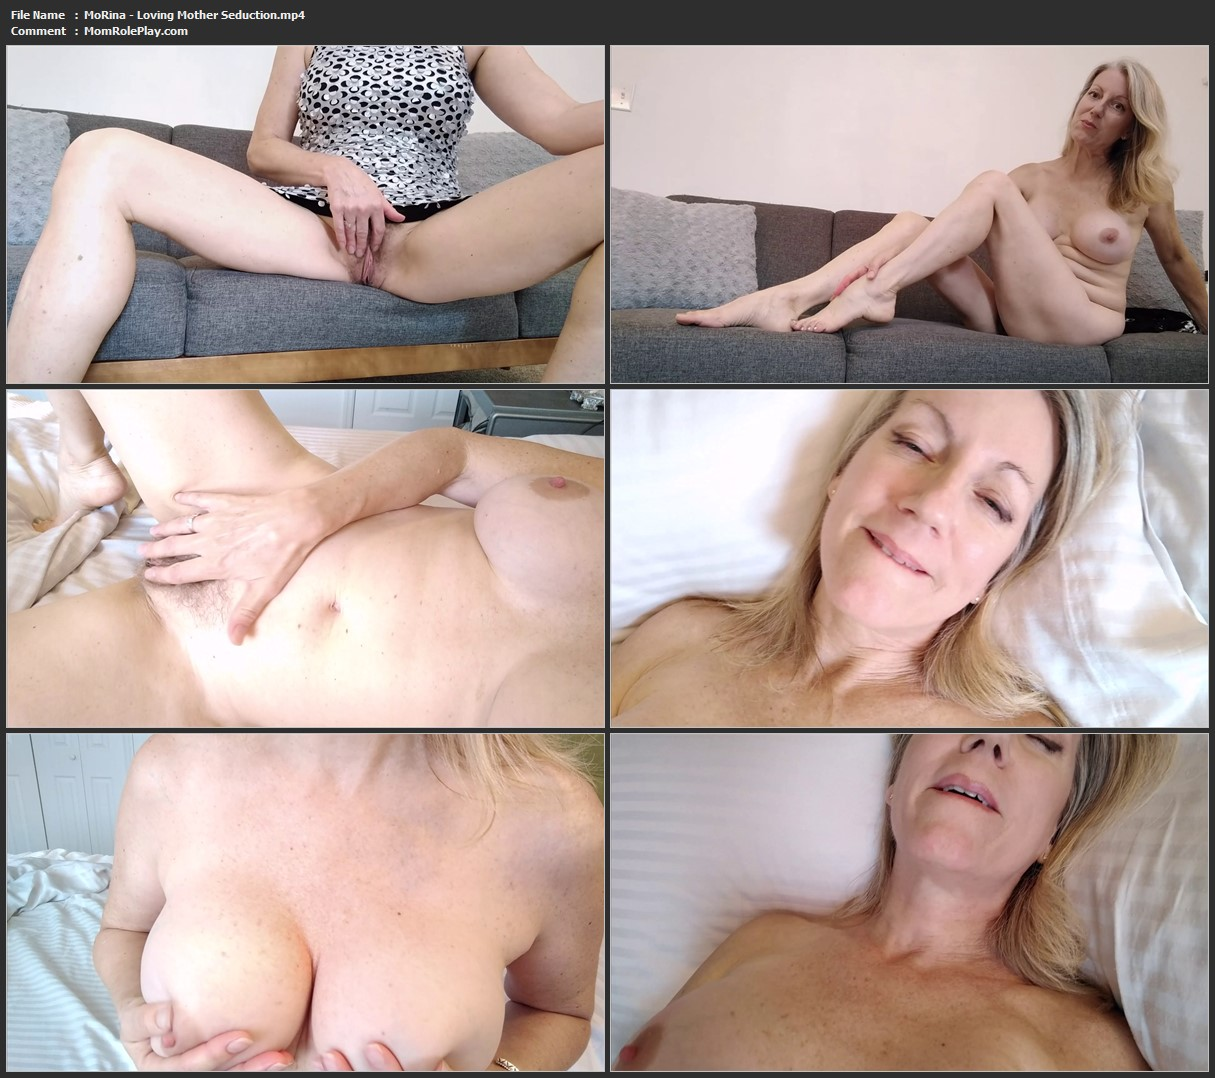 MoRina - Loving Mother Seduction